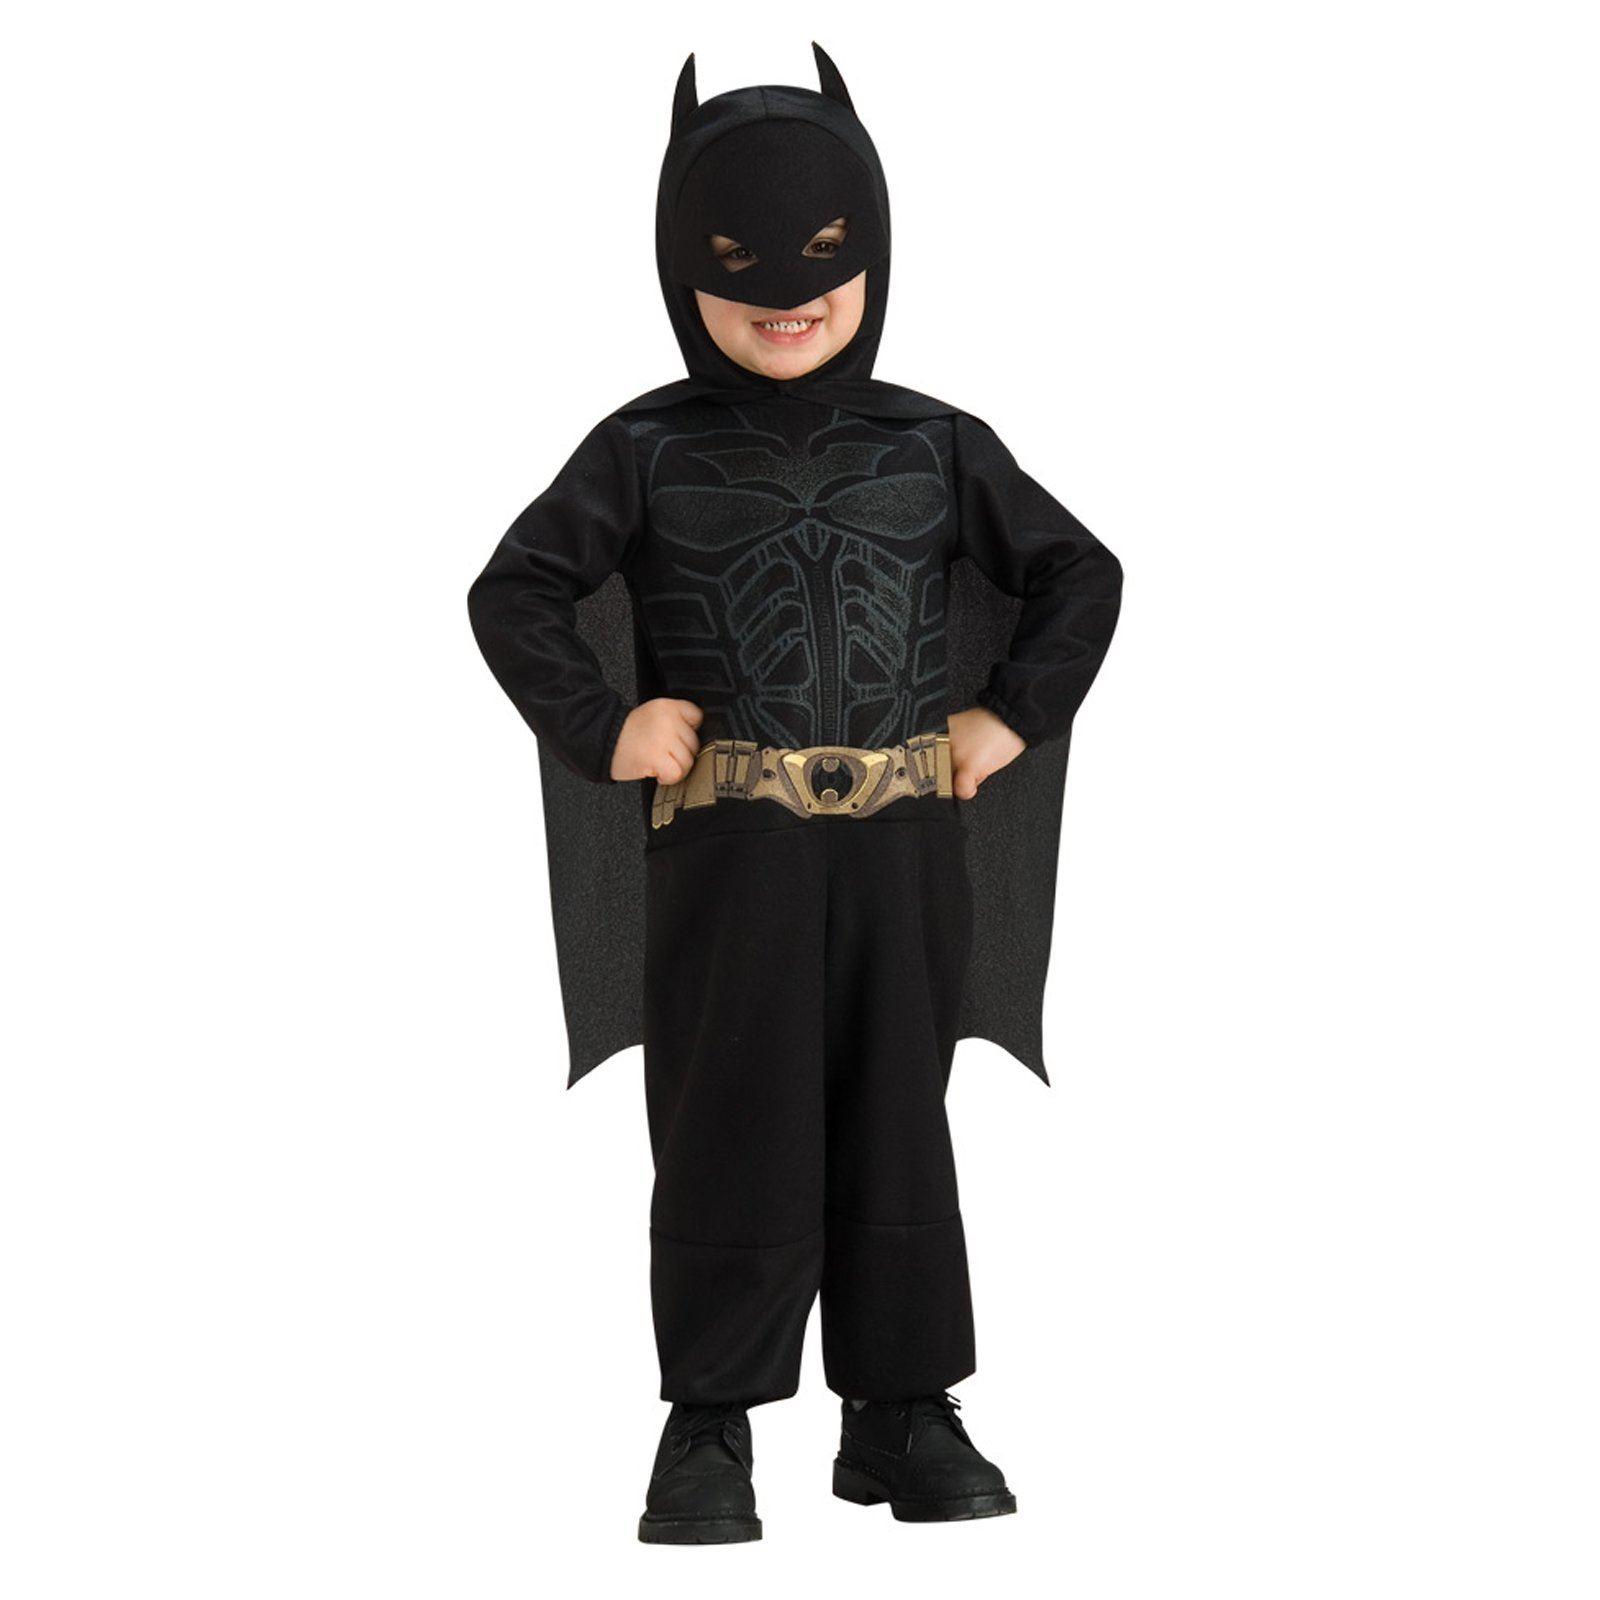 Batman Halloween Costume Toddler Batman Toddler Halloween